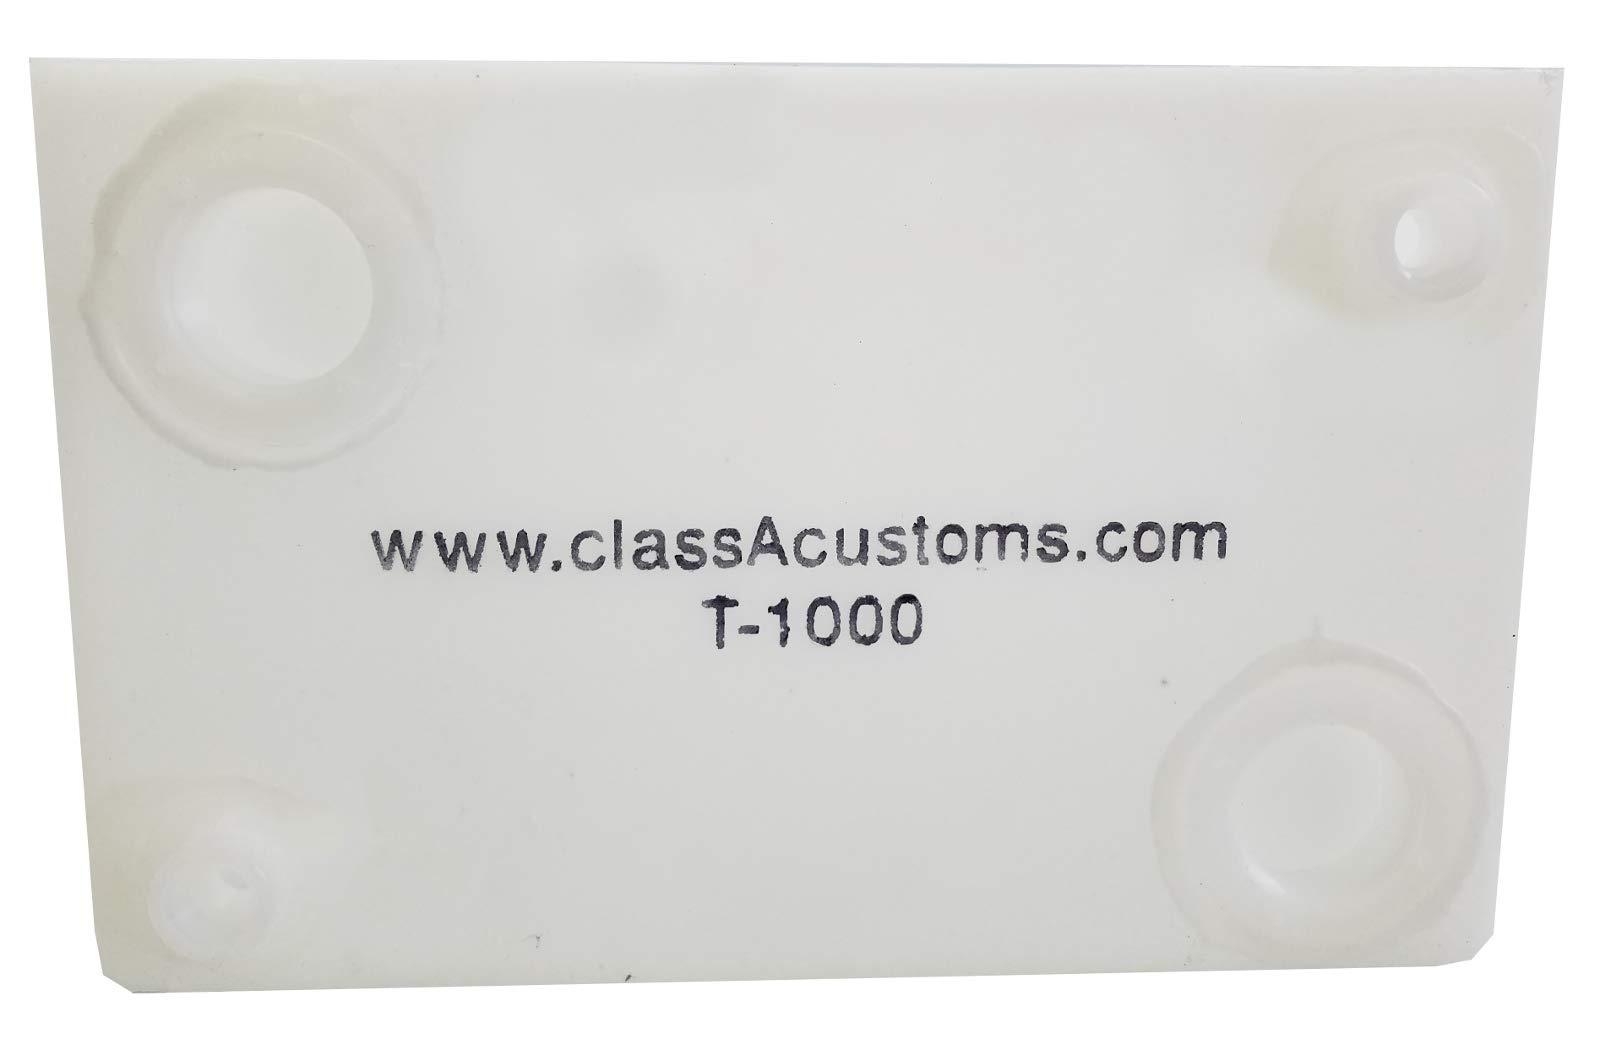 Class A Customs | T-1000 | One (1) RV Fresh Water 10 Gallon Tank, Grey Water